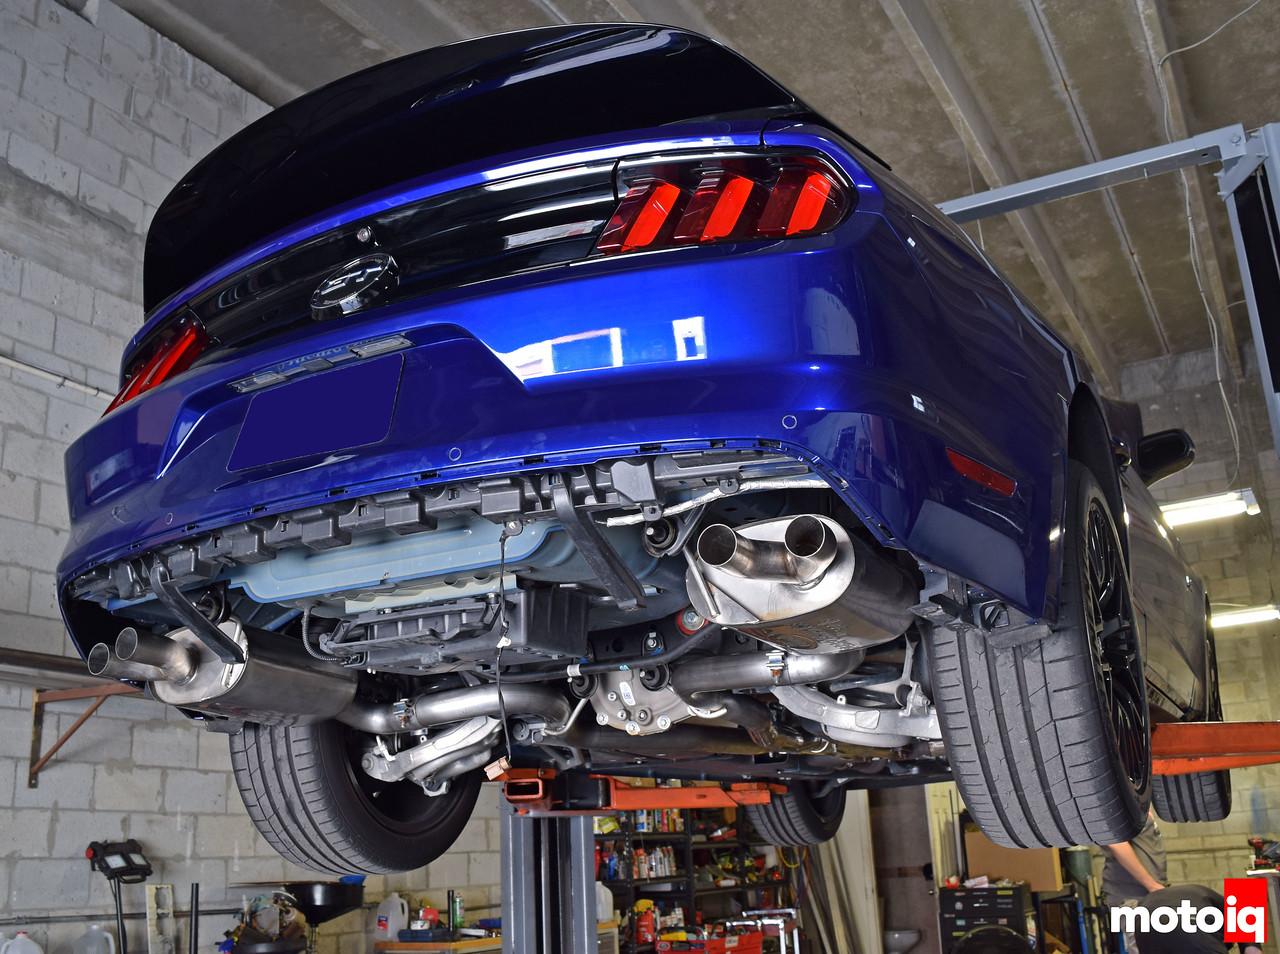 2015 Mustang GT Ford Performance GT350 muffler installed